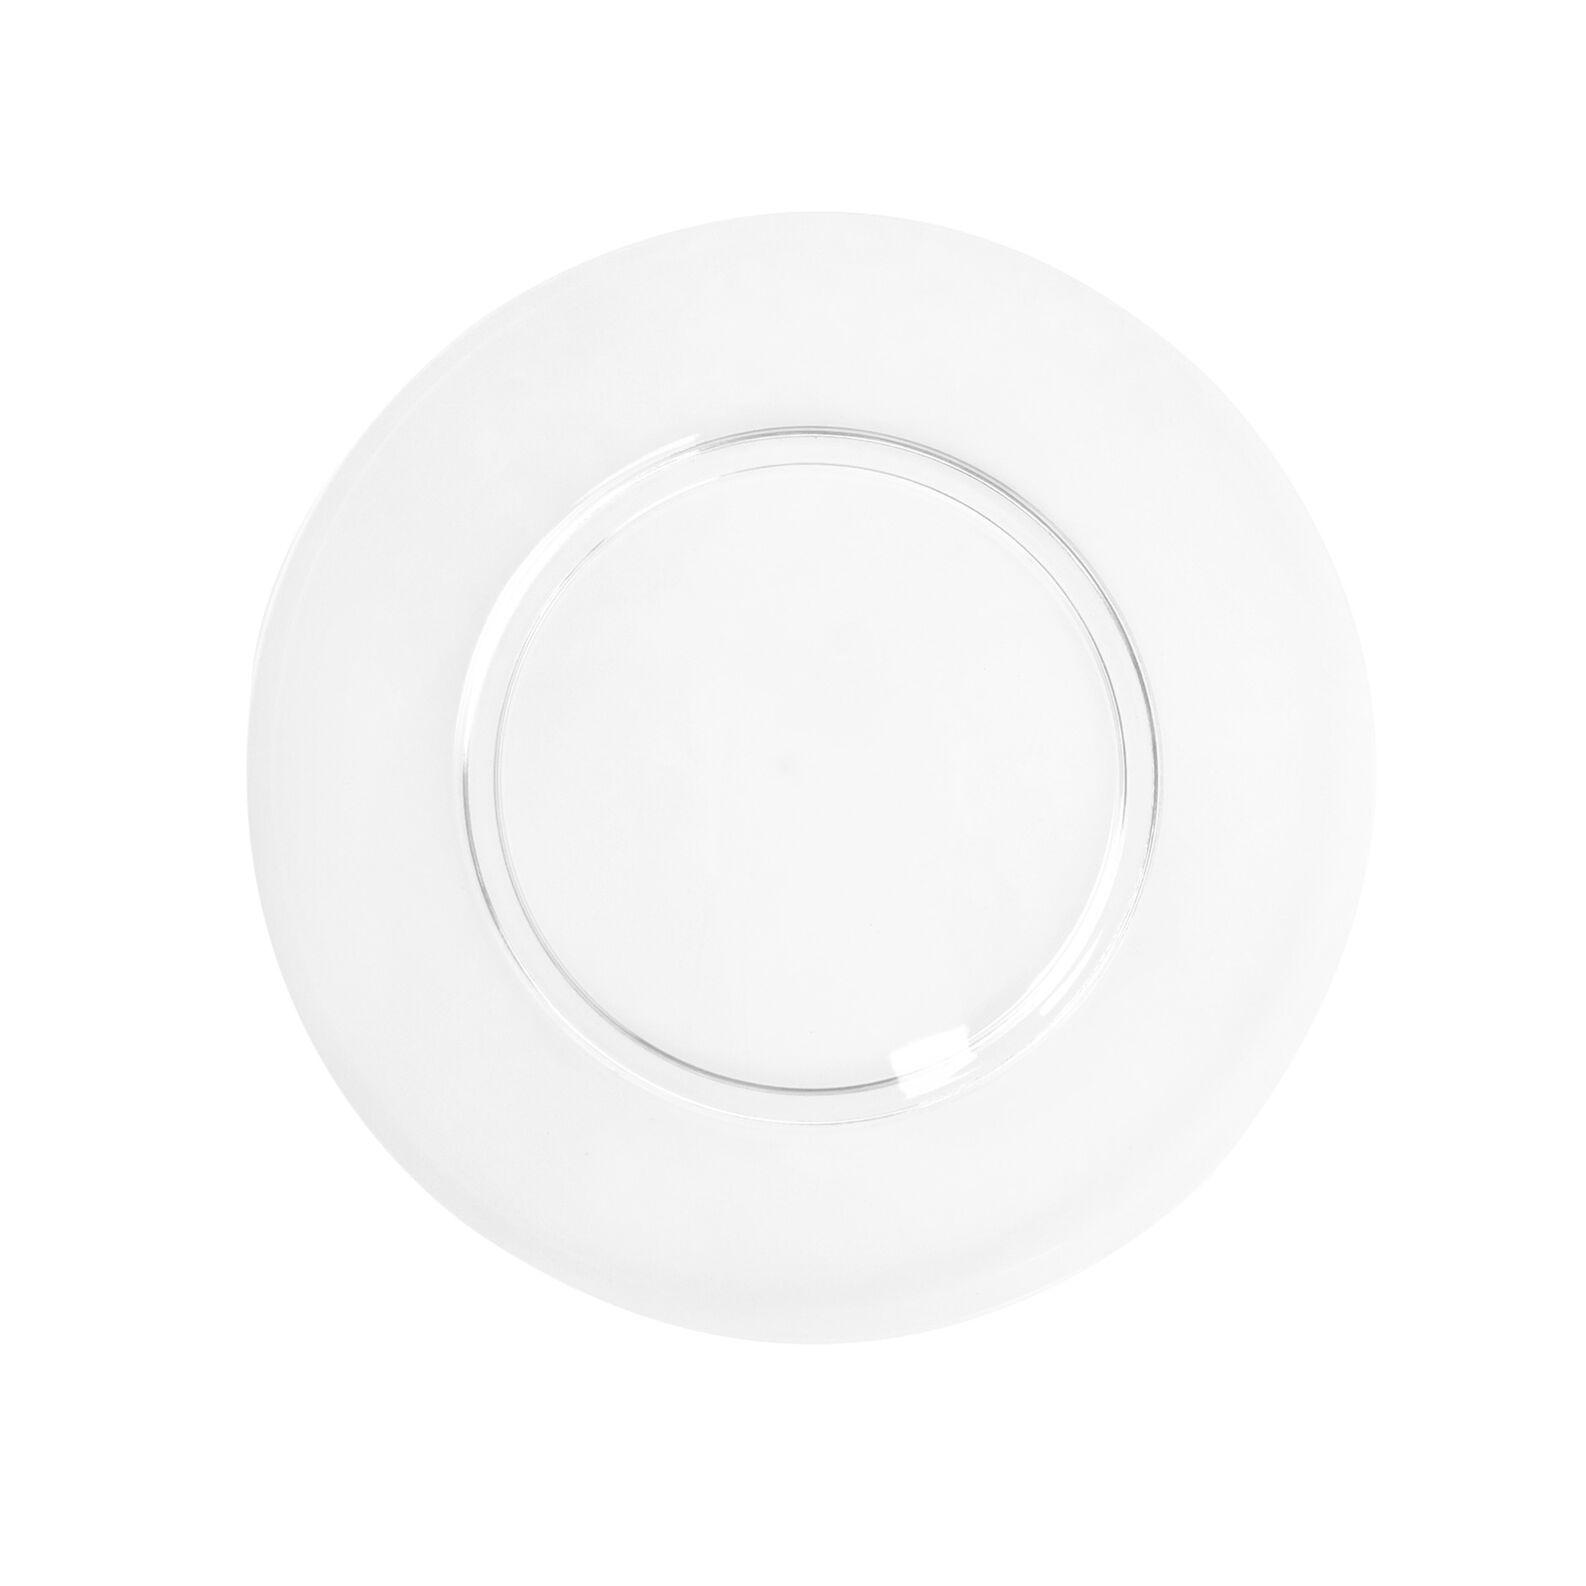 MS plastic dinner plate